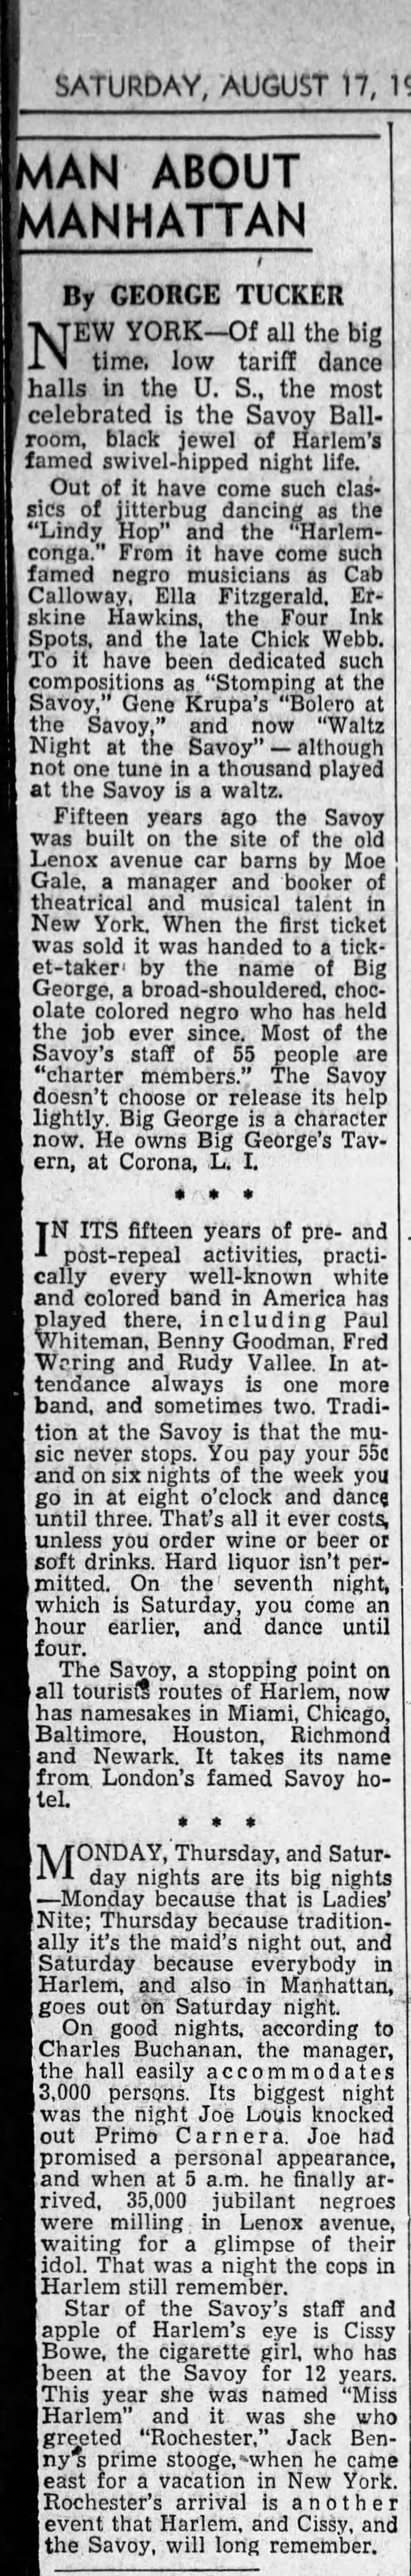 1940 column on Savoy Monrovia_Daily_News_Post_Sat__Aug_17__1940_